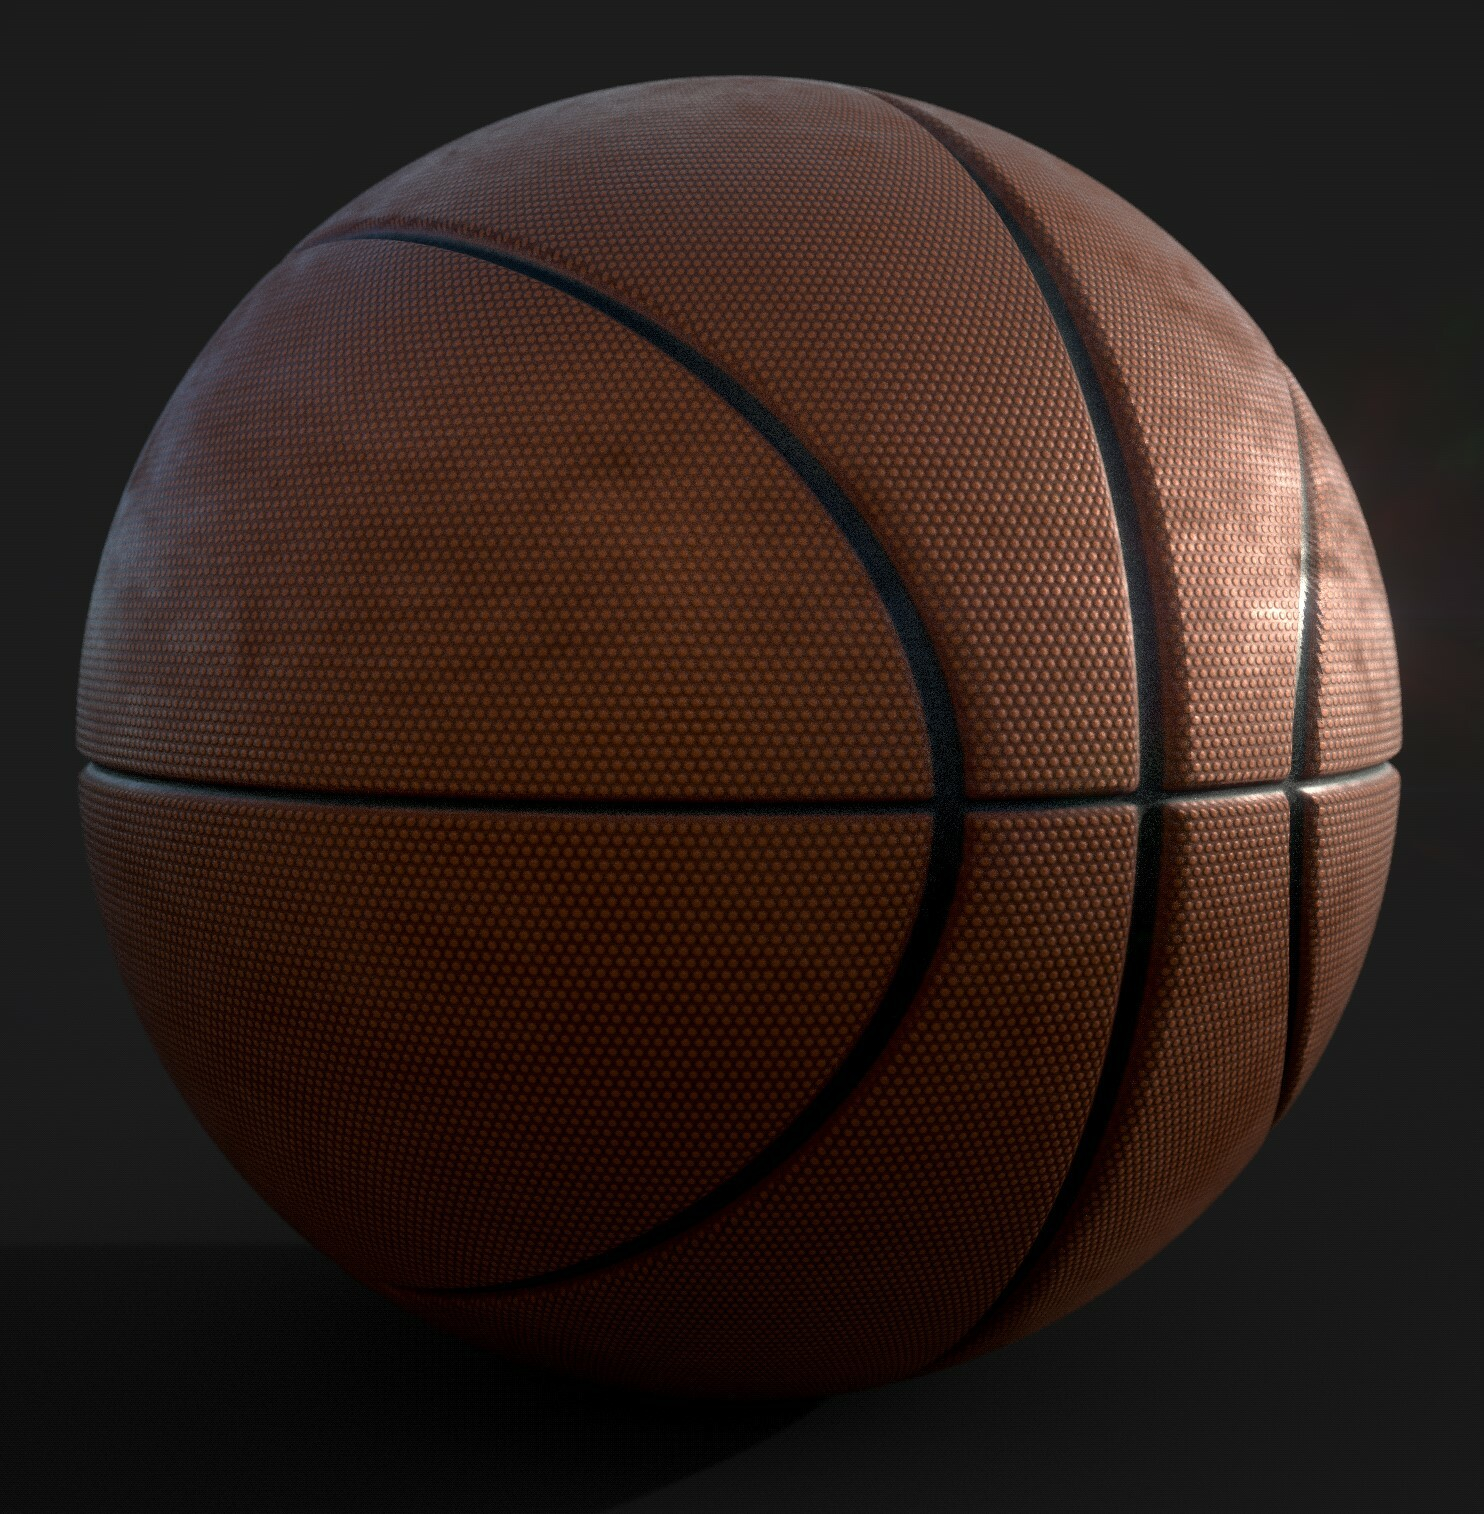 Marcelo souza basketball 01 05 b